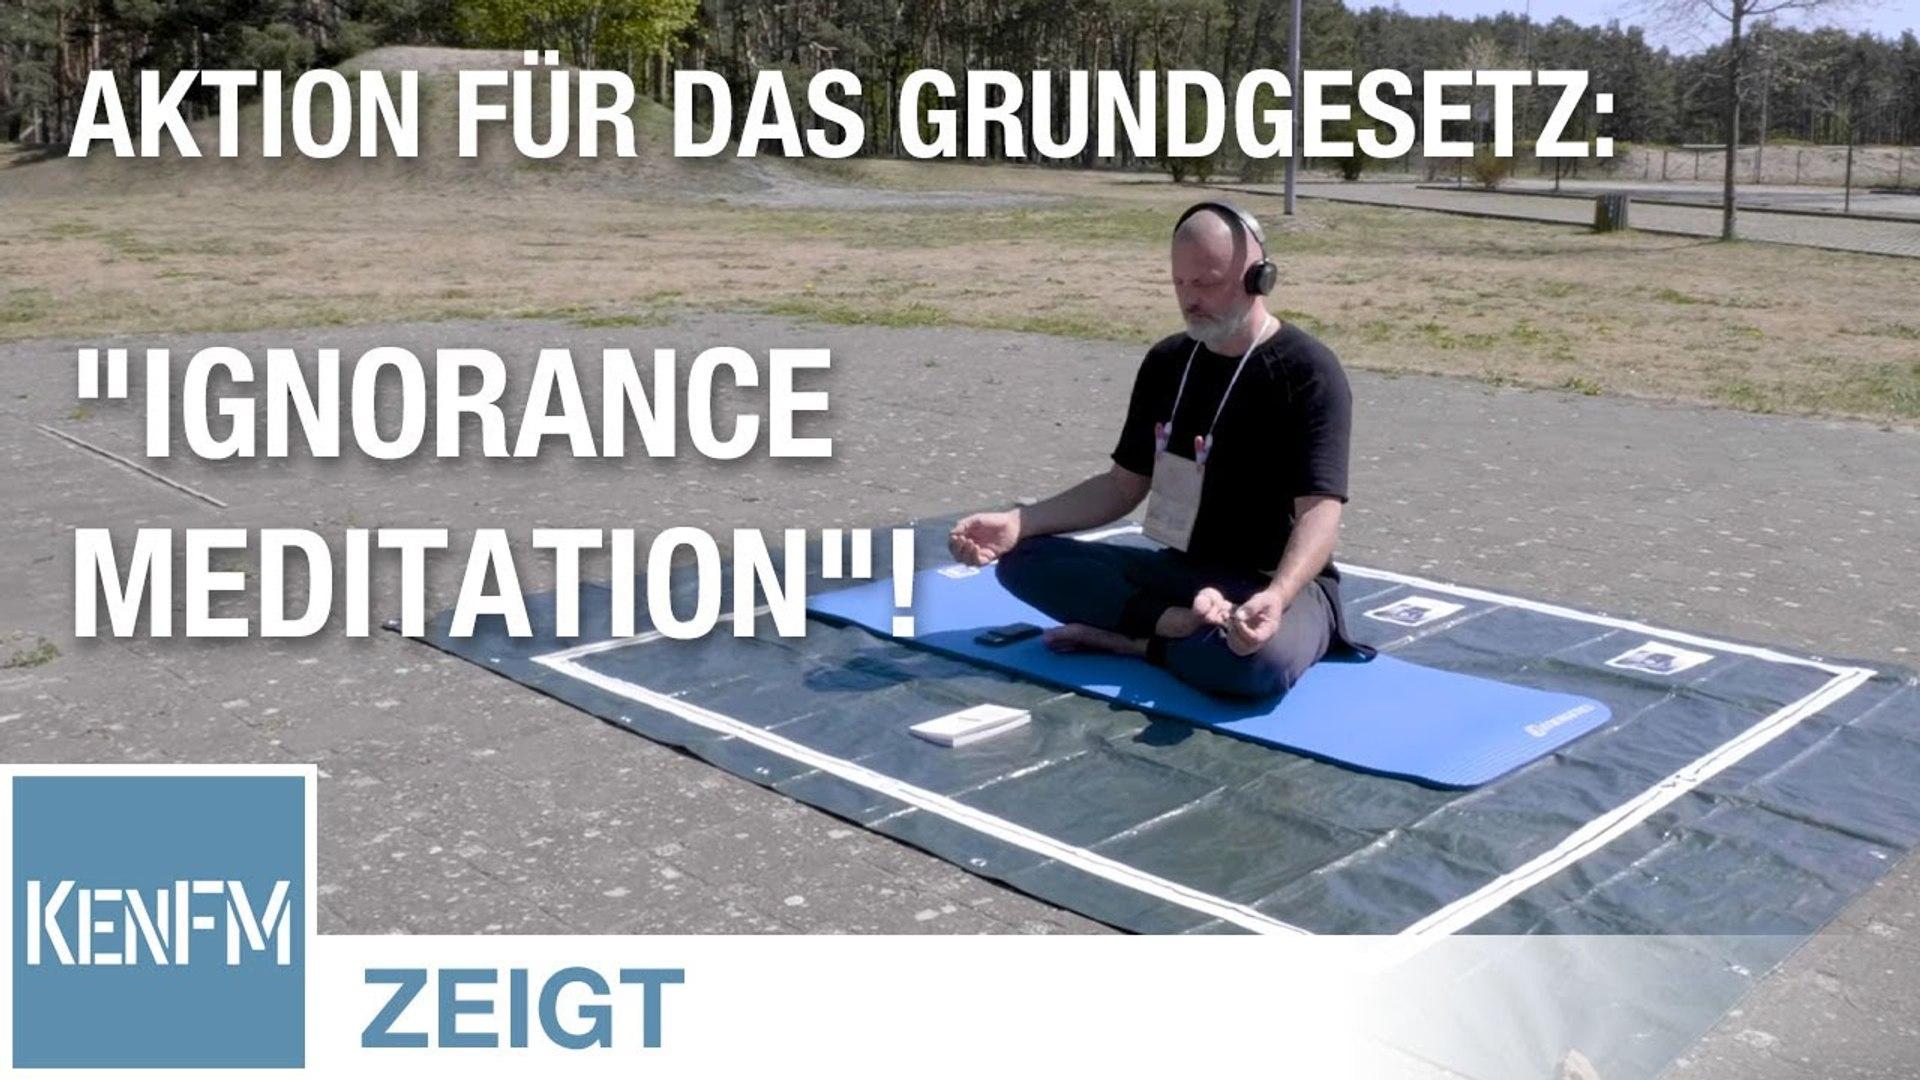 Ignorance Meditation